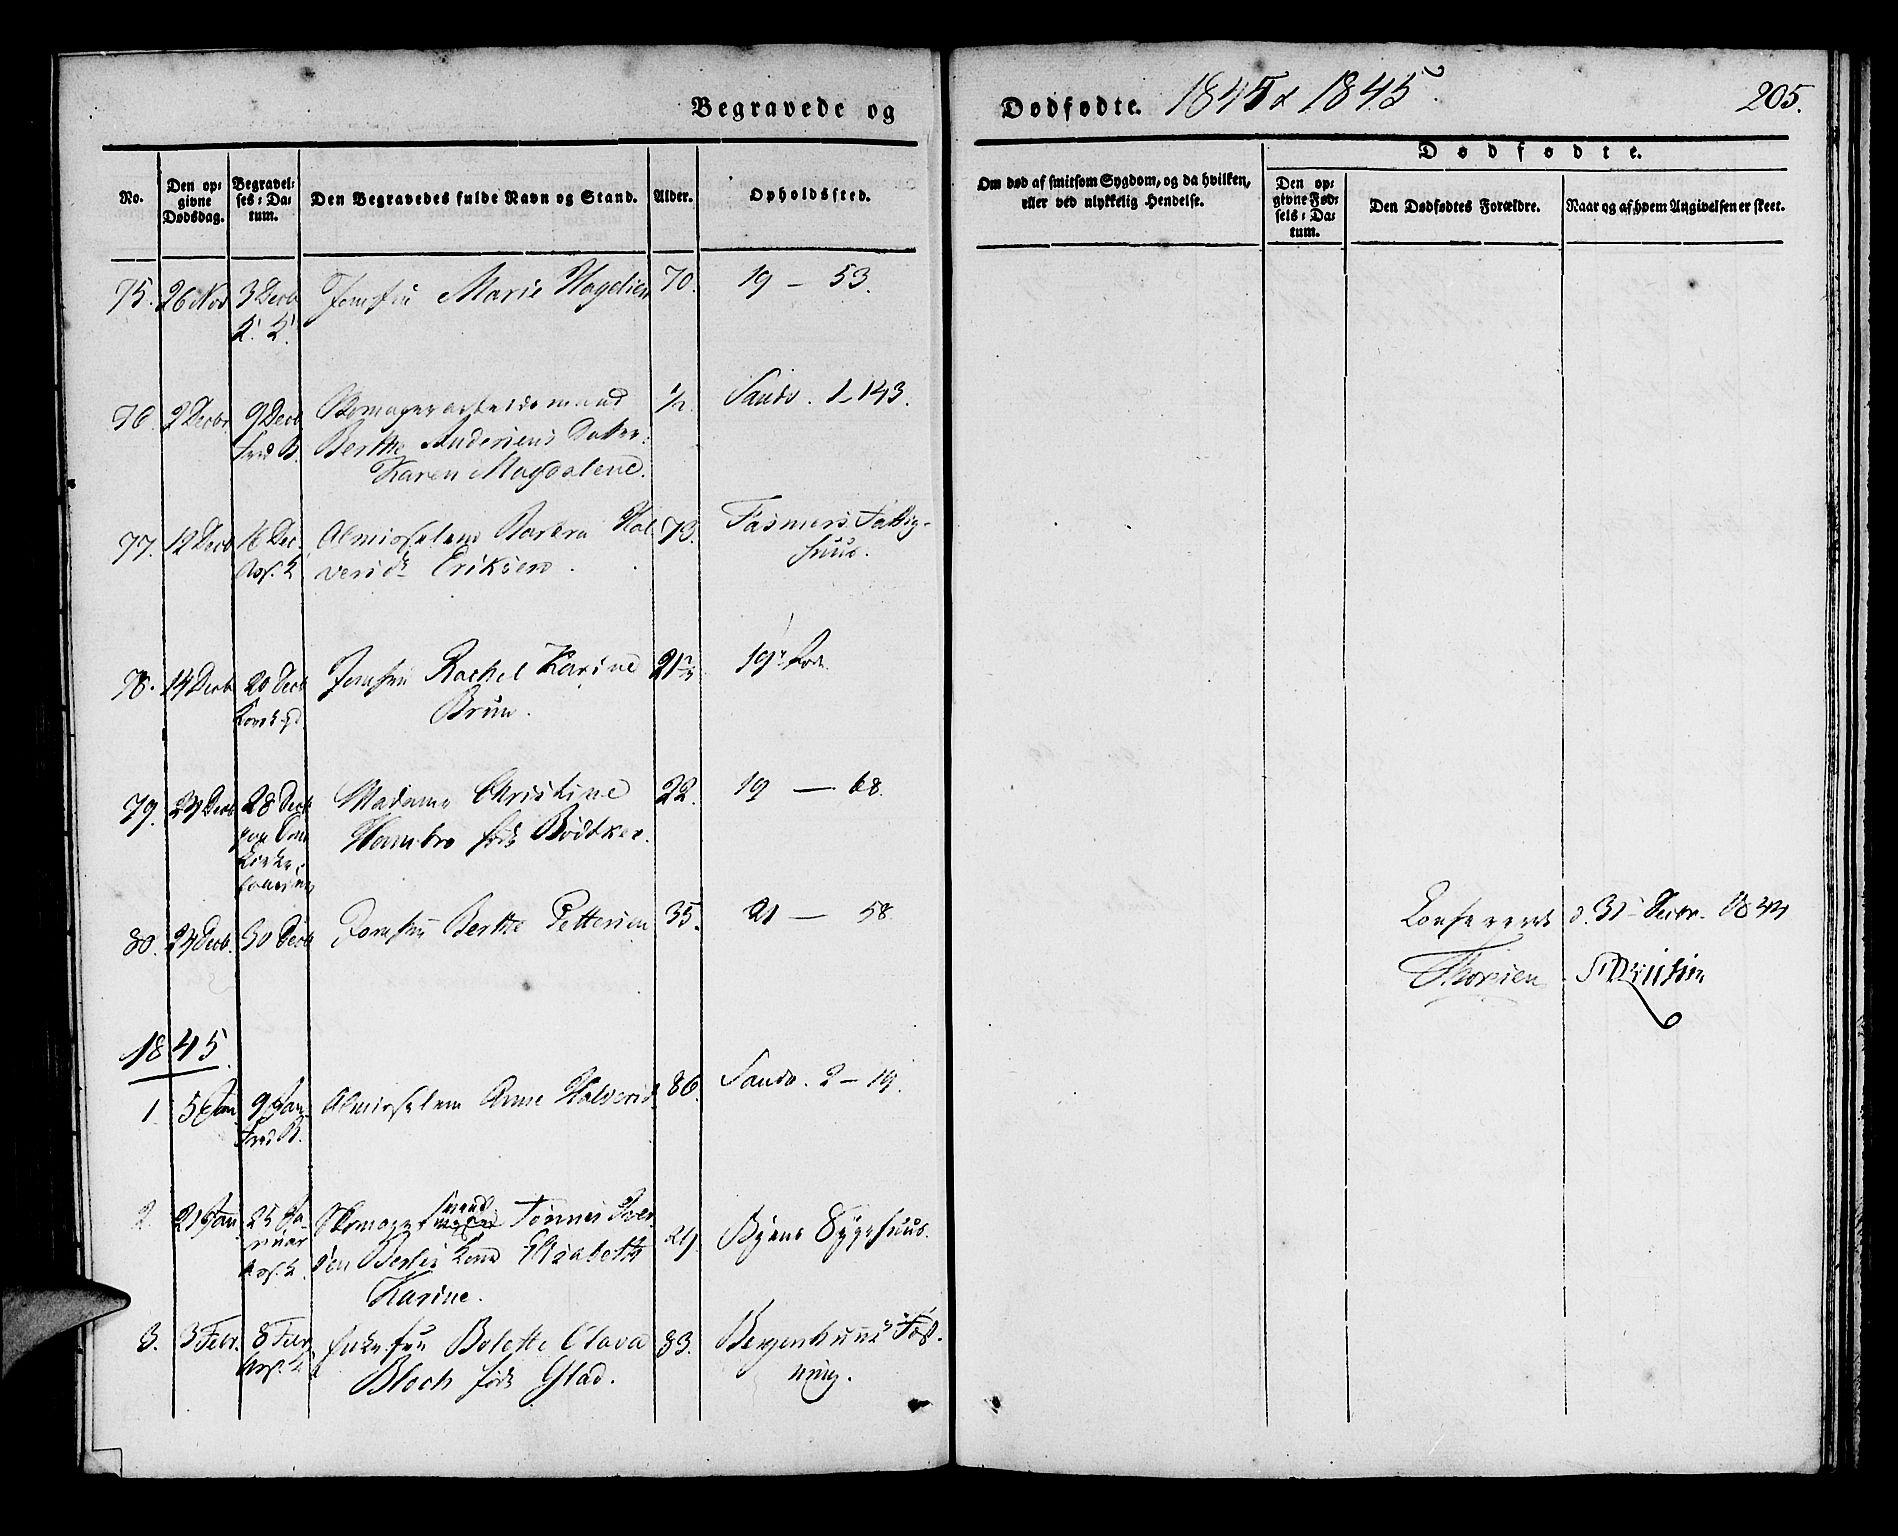 SAB, Korskirken Sokneprestembete, H/Haa/L0043: Ministerialbok nr. E 1, 1834-1848, s. 205